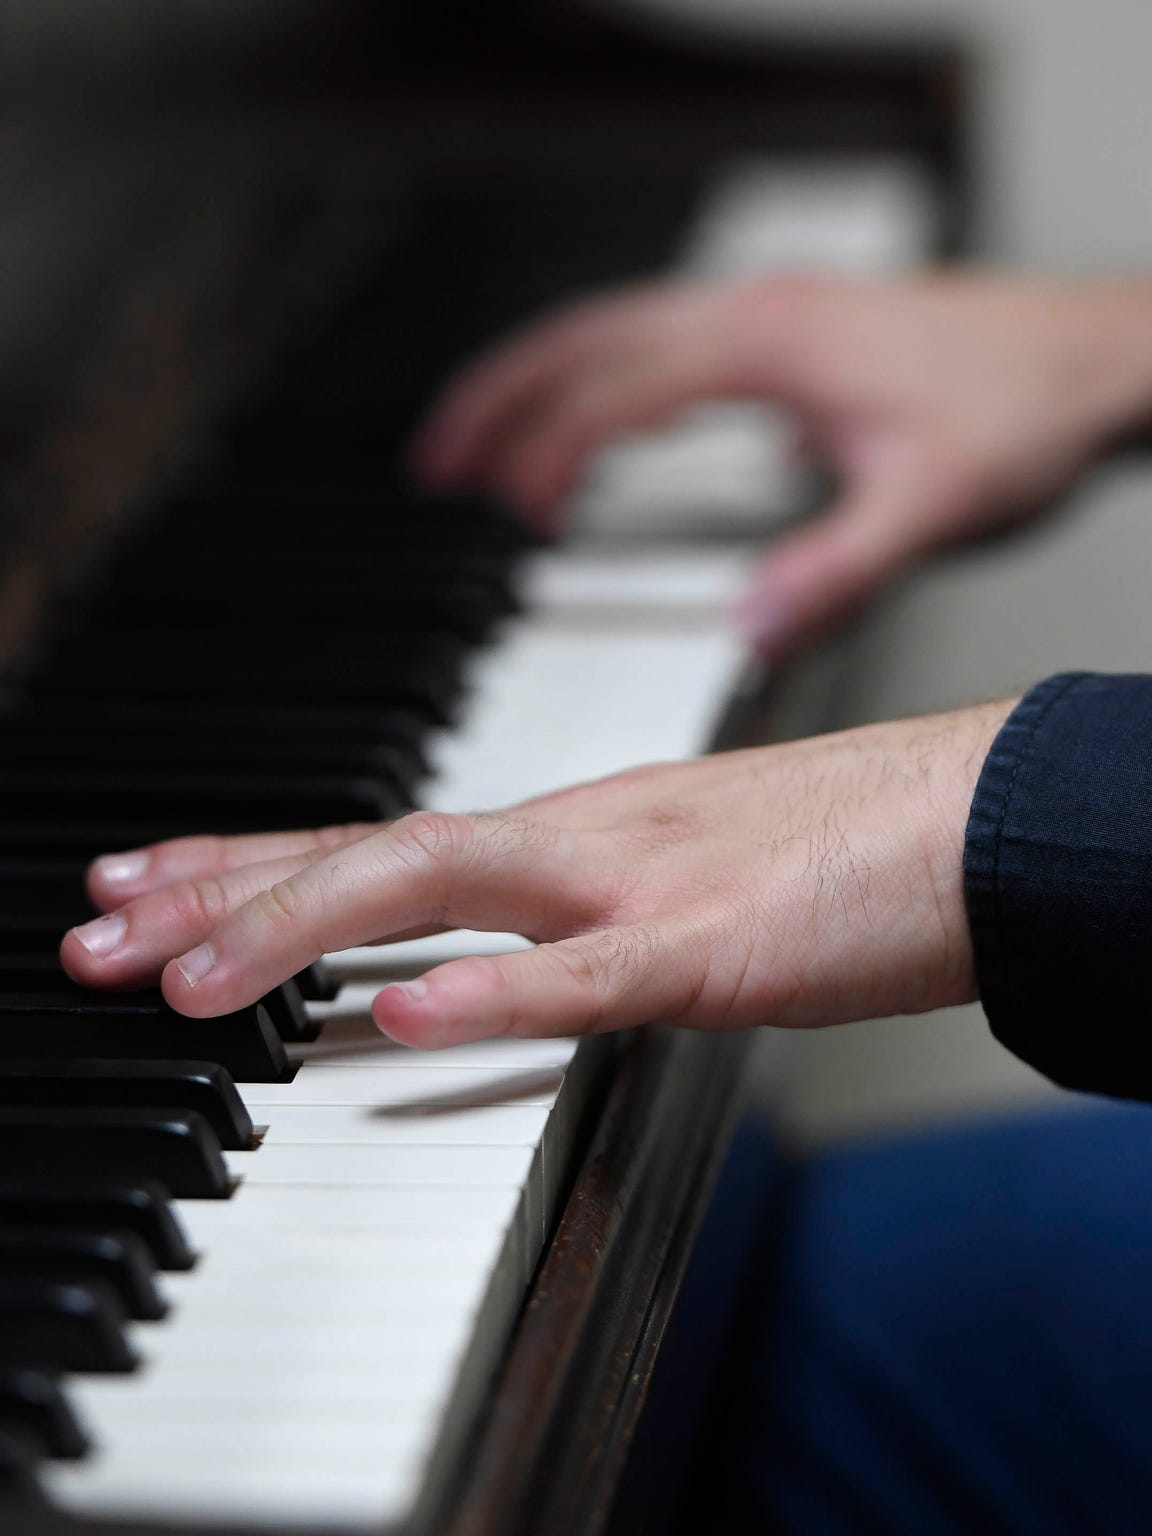 Fingers on the keys, Brazilian musician Rafael Pereida